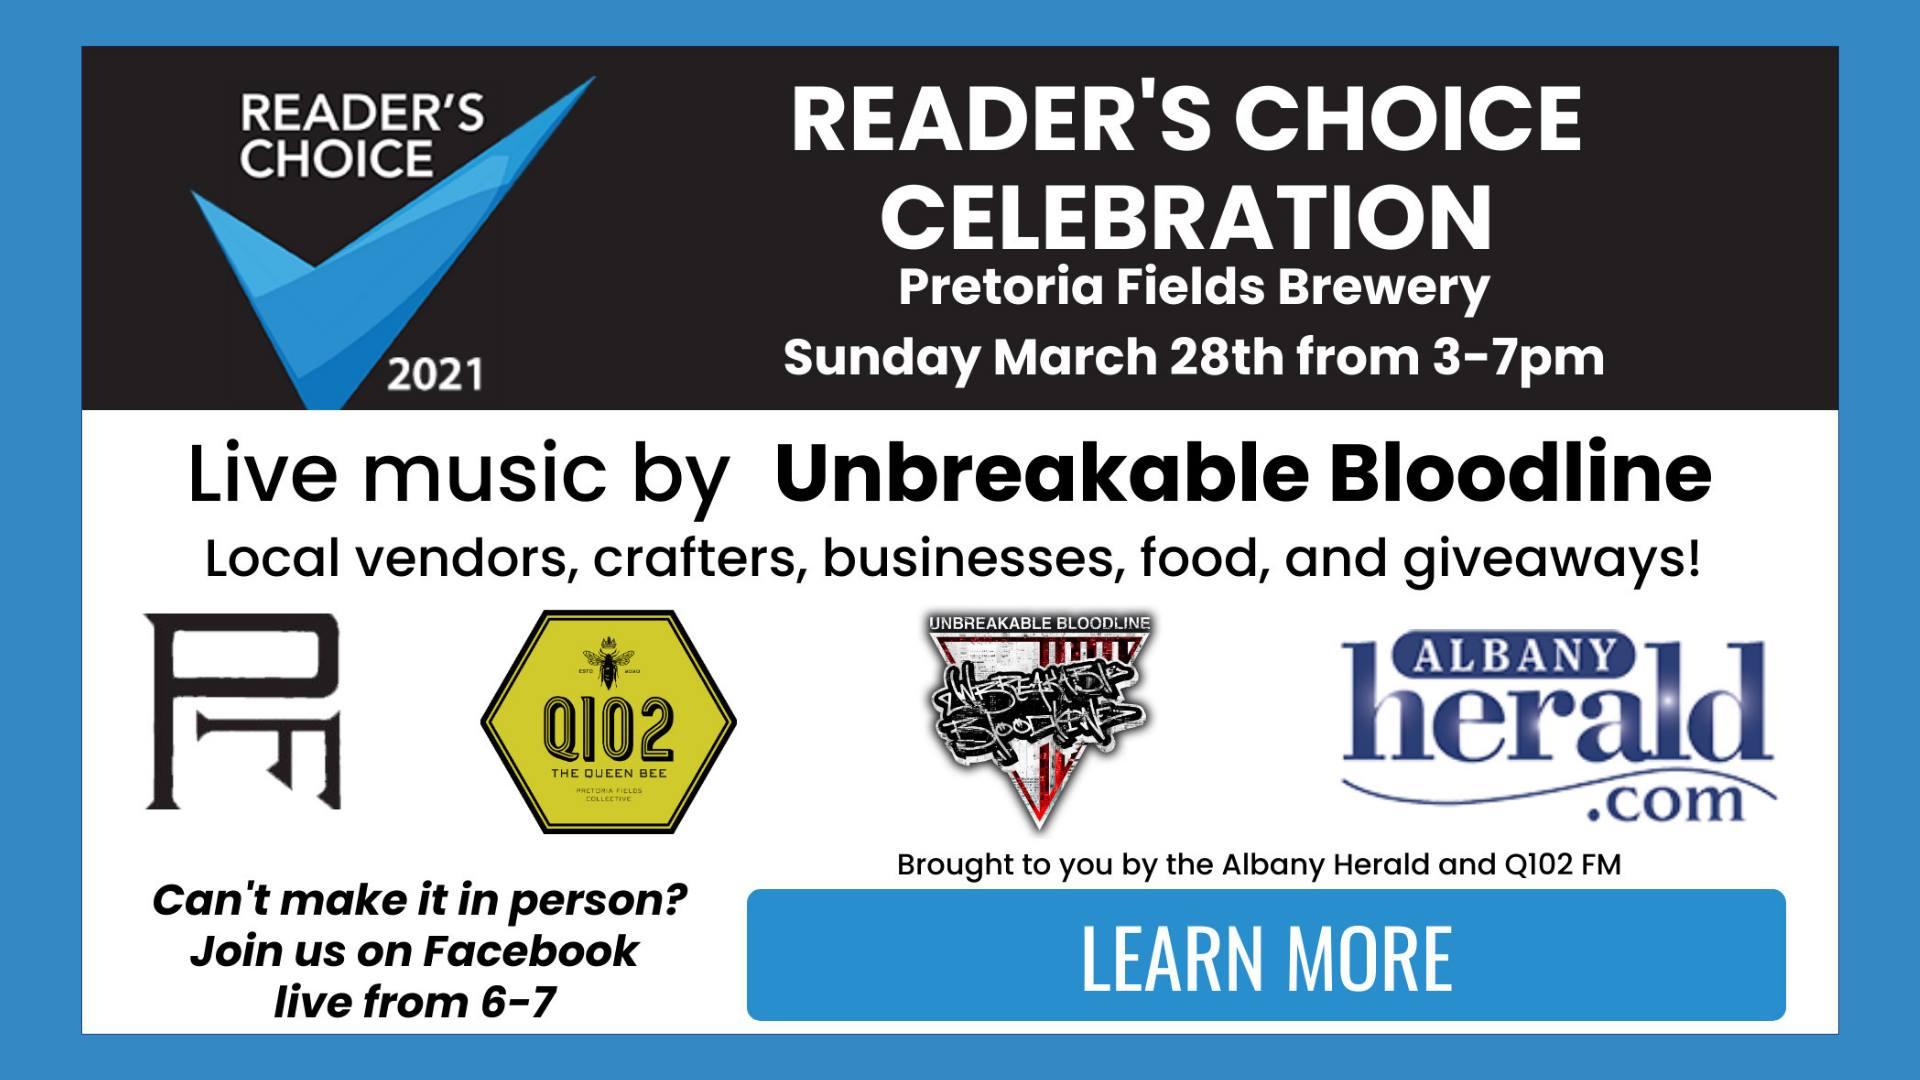 Reader's Choice Celebration